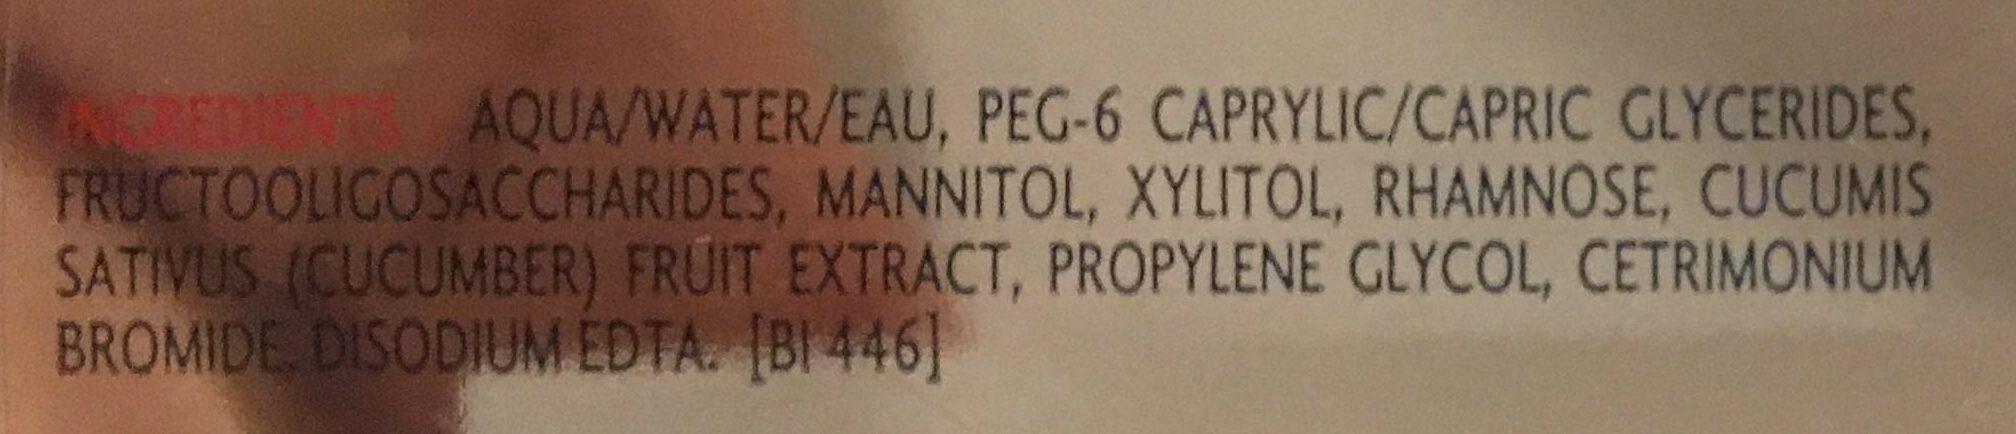 Créaline H2O - Ingredients